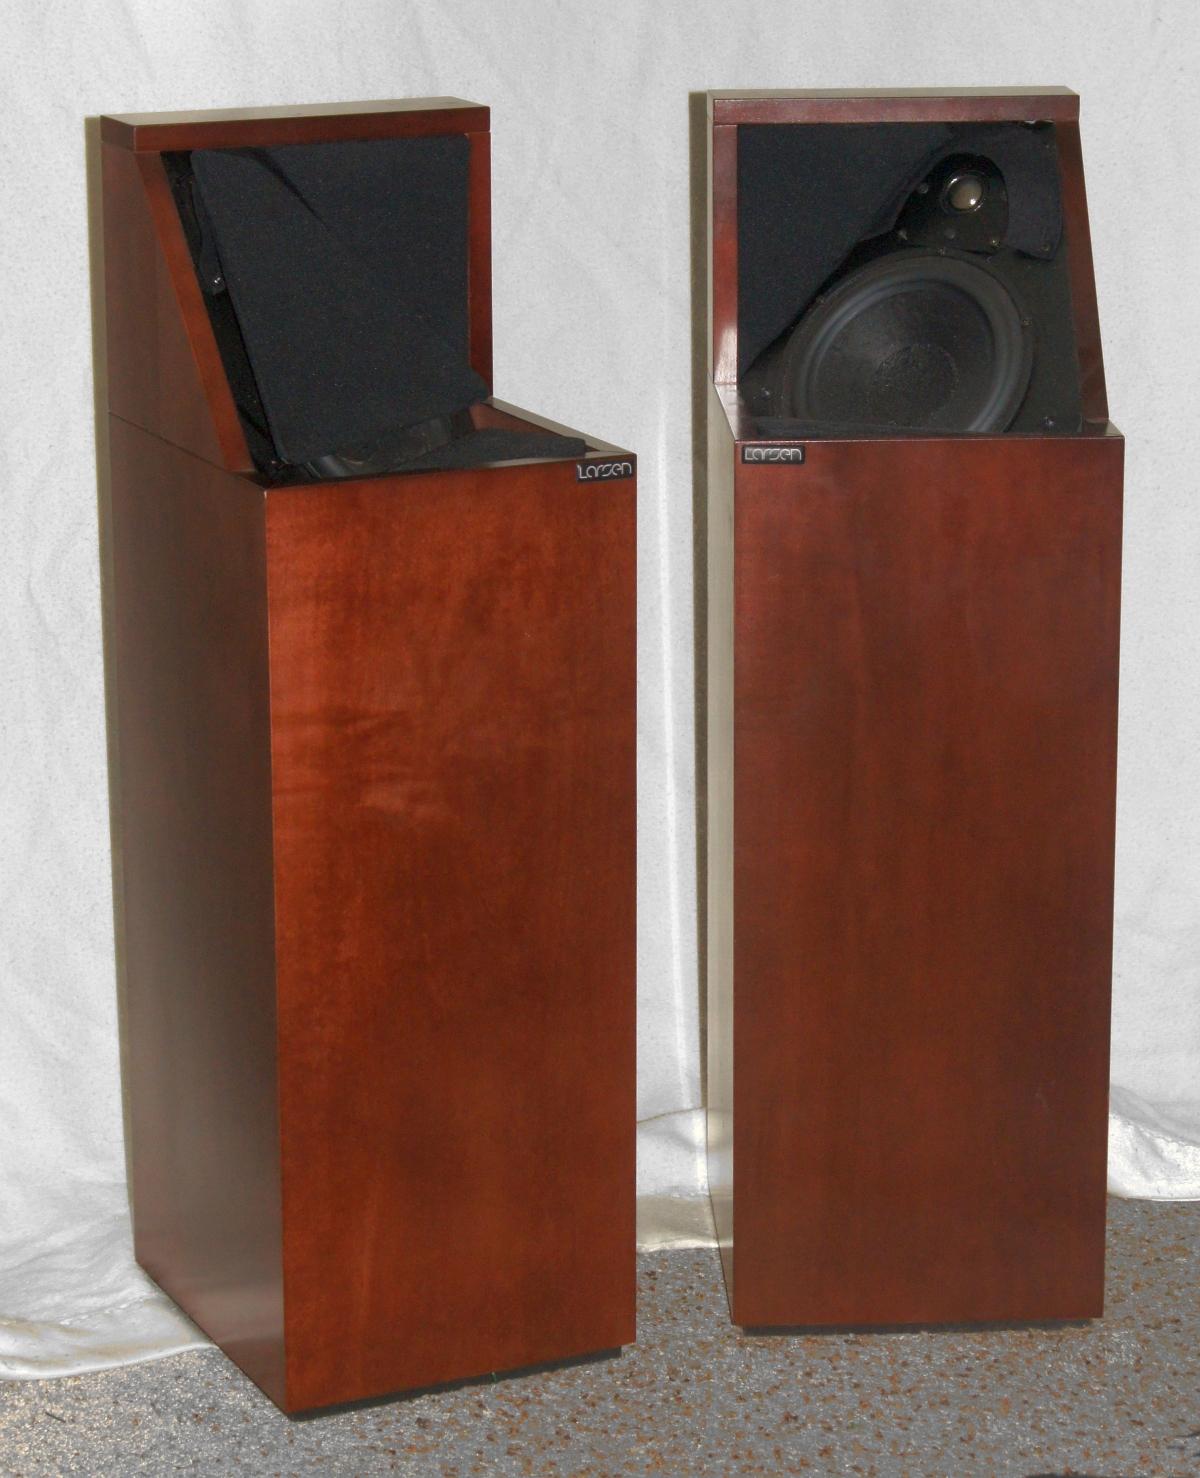 Larsen Model 6.2 Loudspeakers